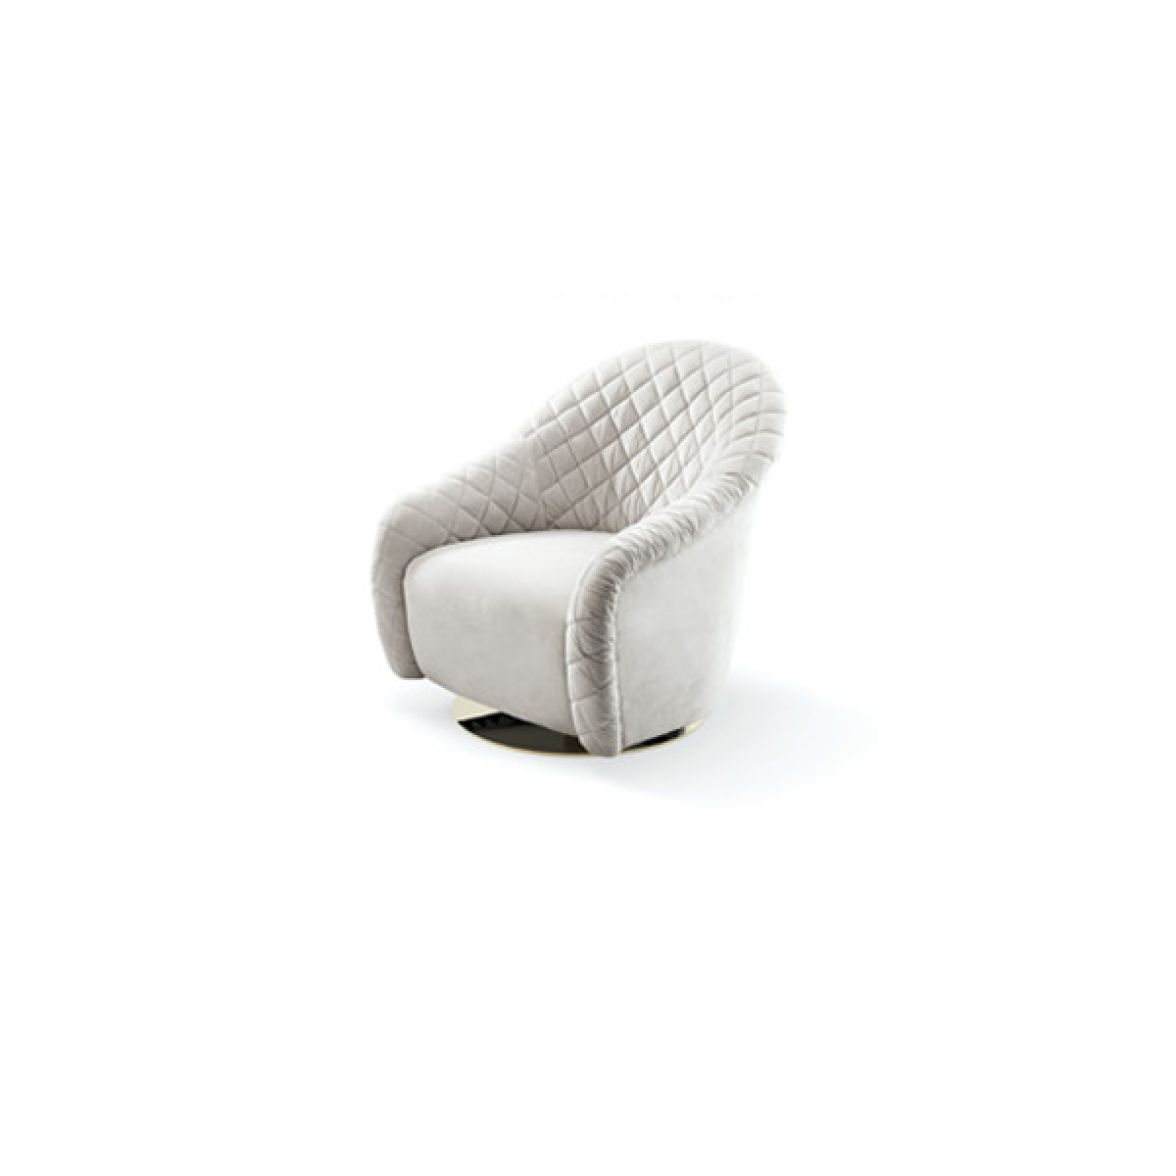 Portofino armchair